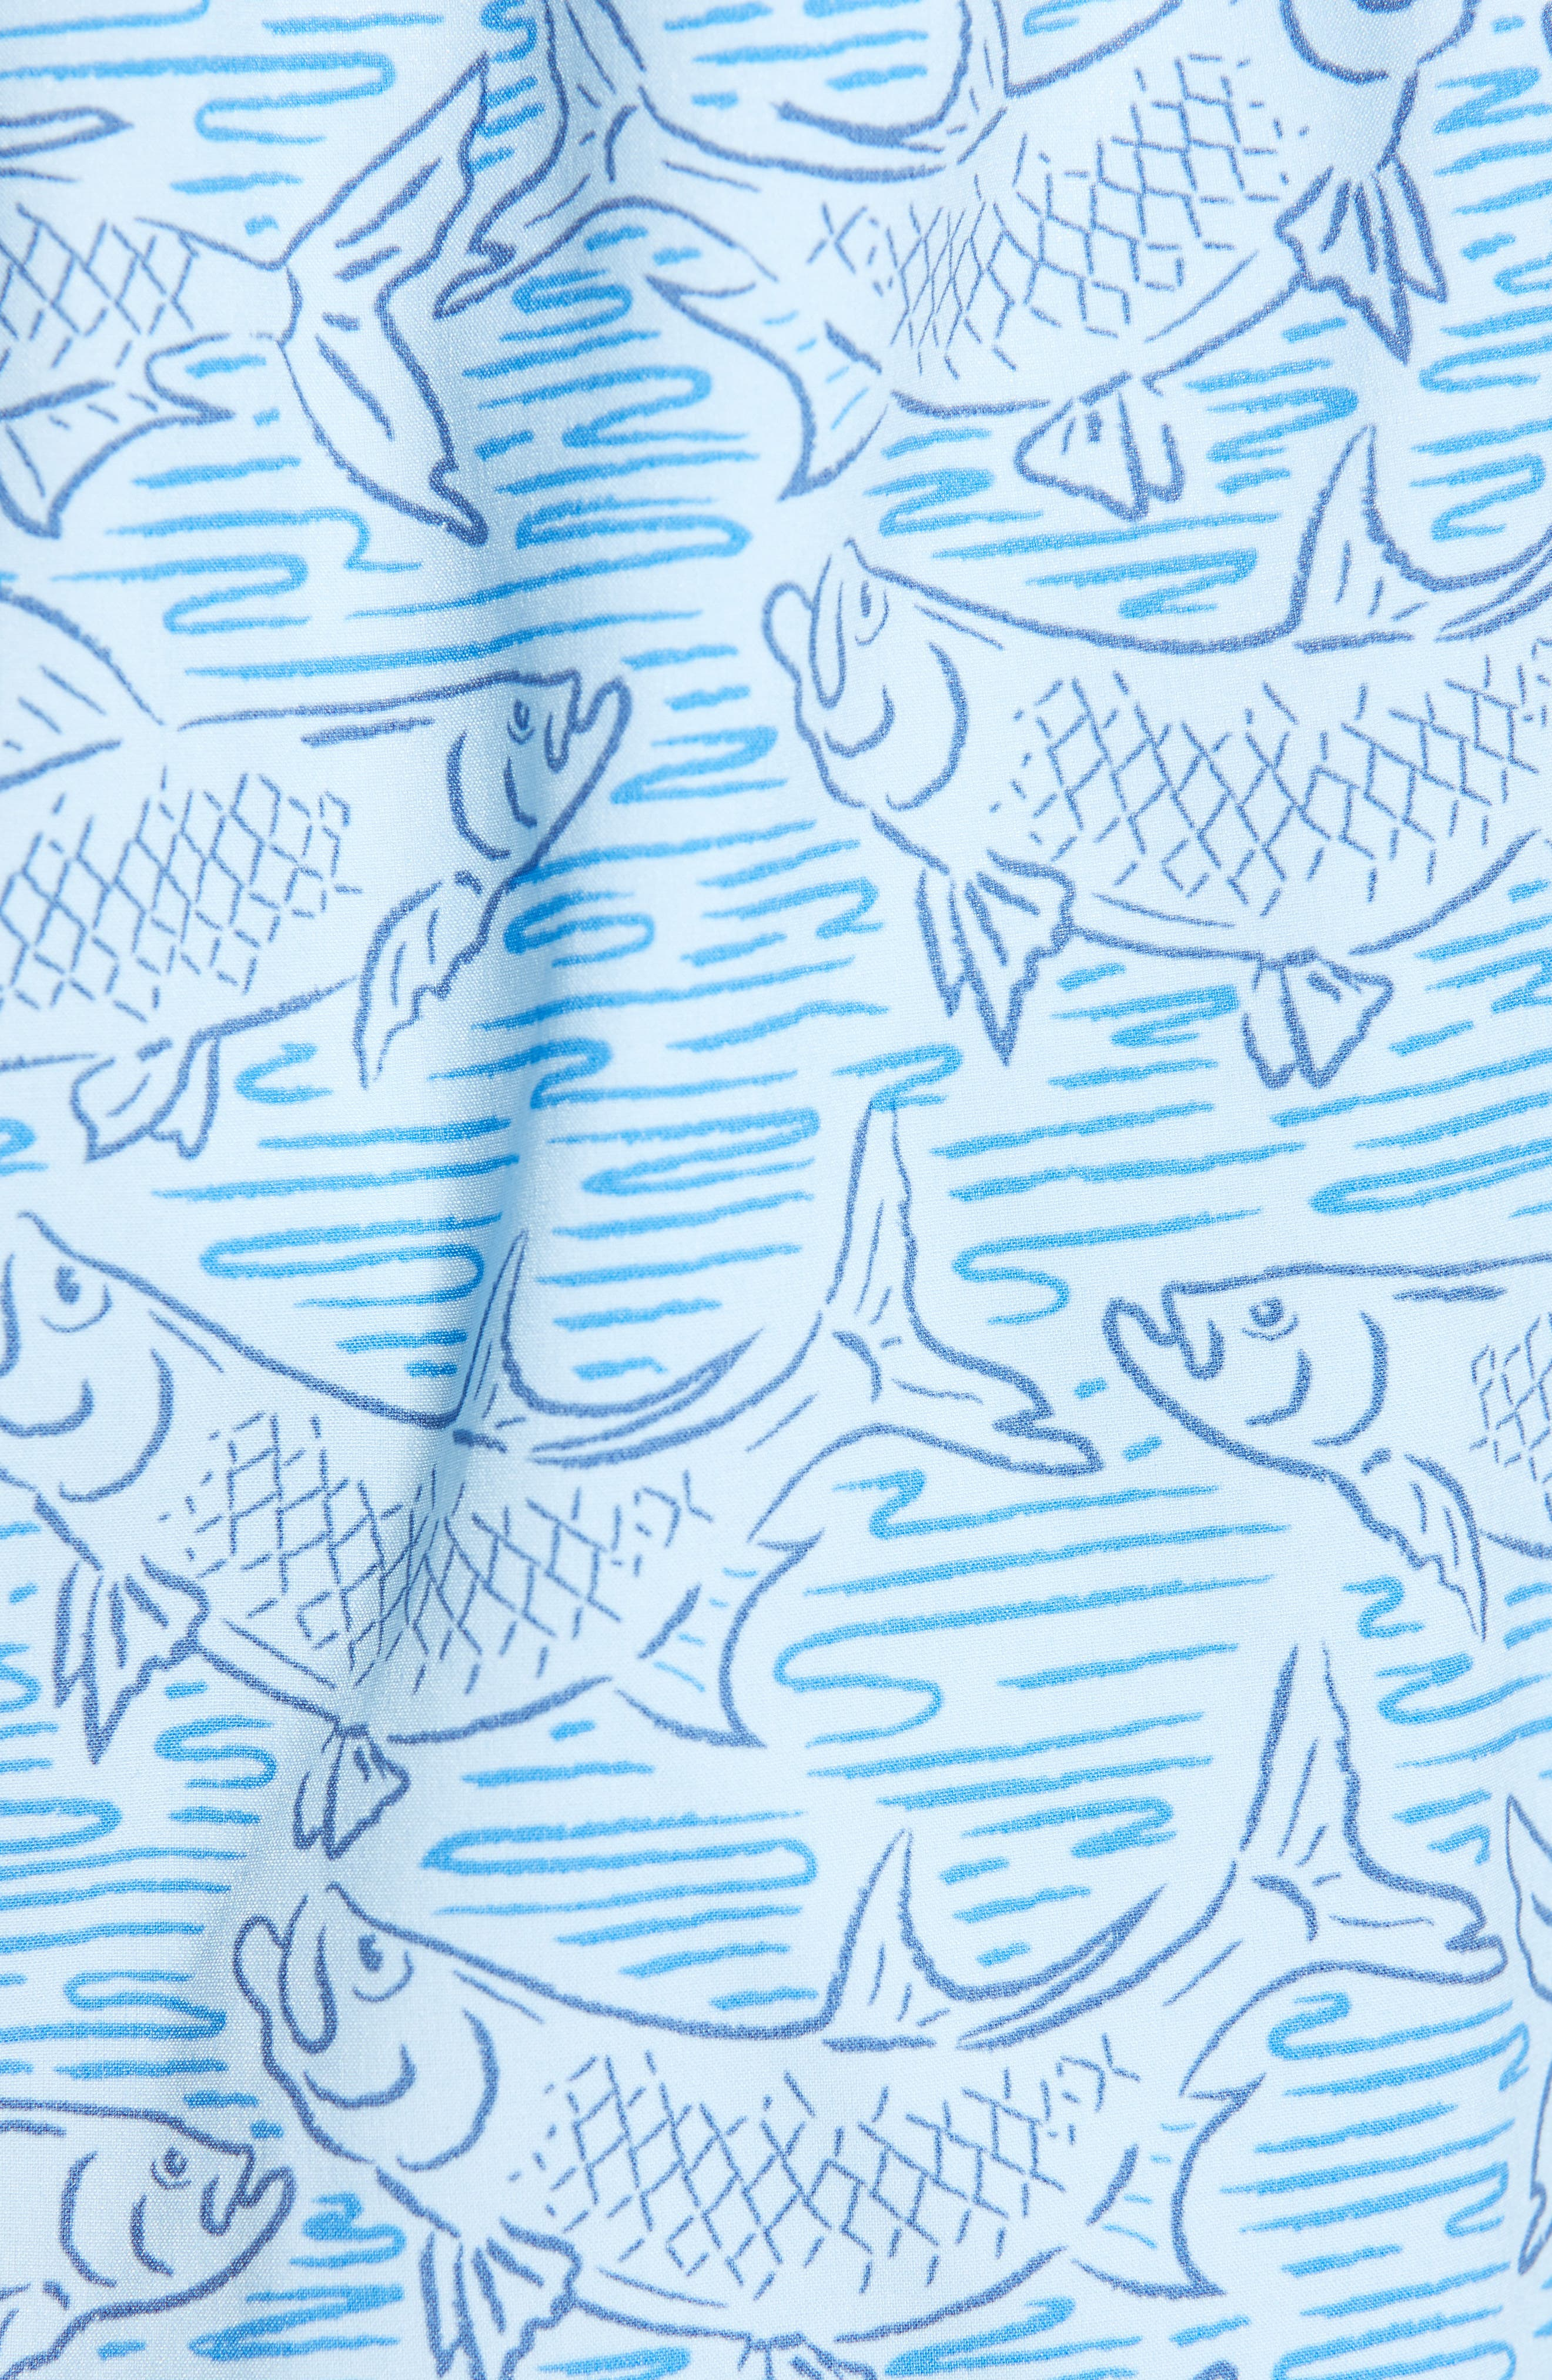 VINEYARD VINES, Chappy Tarpon Stretch Swim Trunks, Alternate thumbnail 5, color, JAKE BLUE